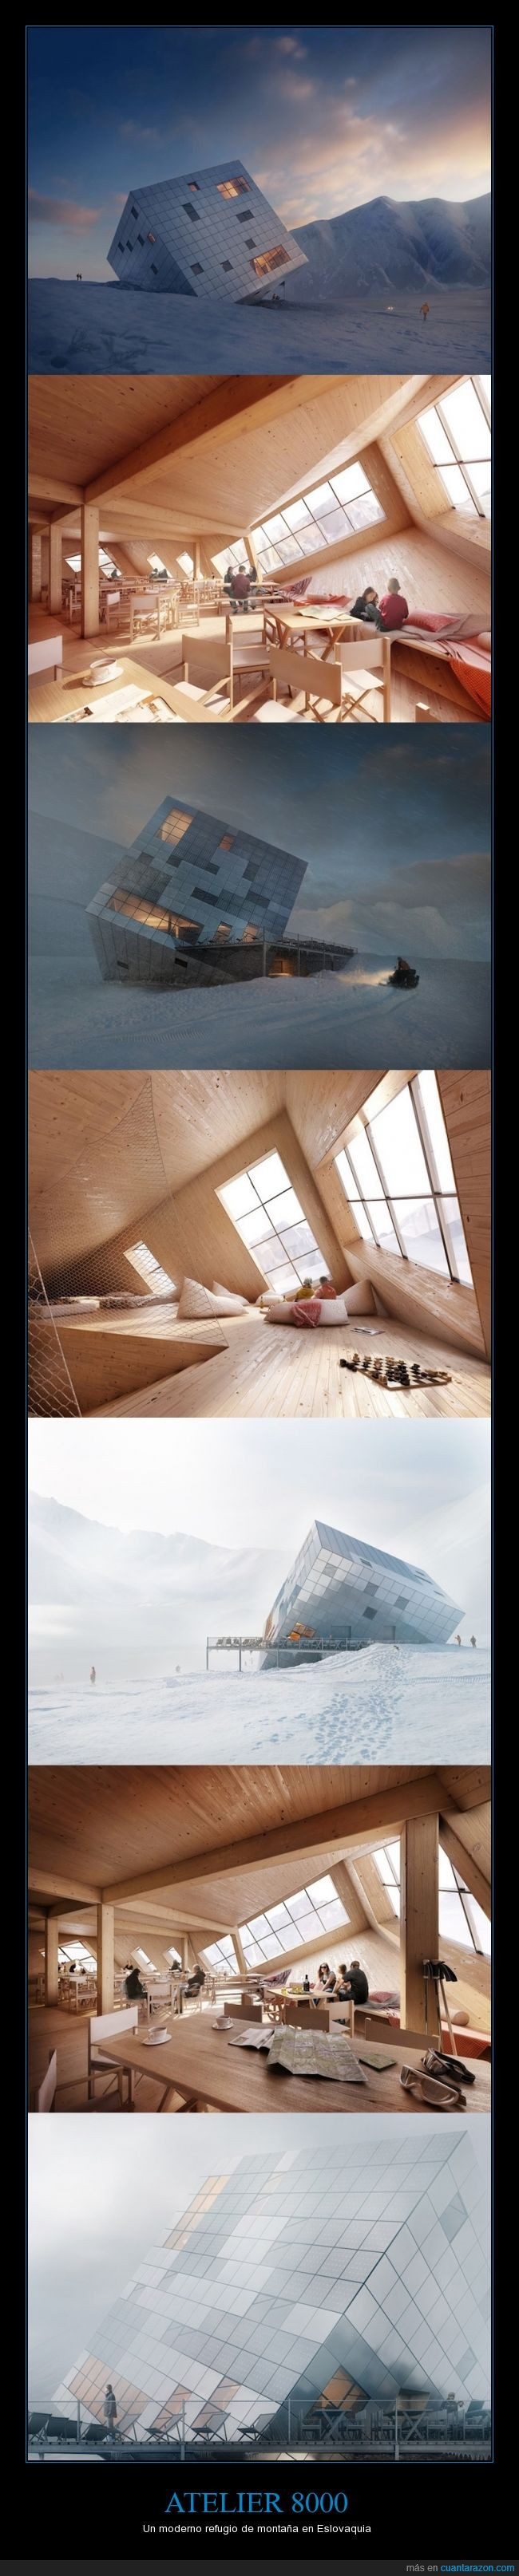 arquitectura,arte,curioso,moderno,montaña,refugio